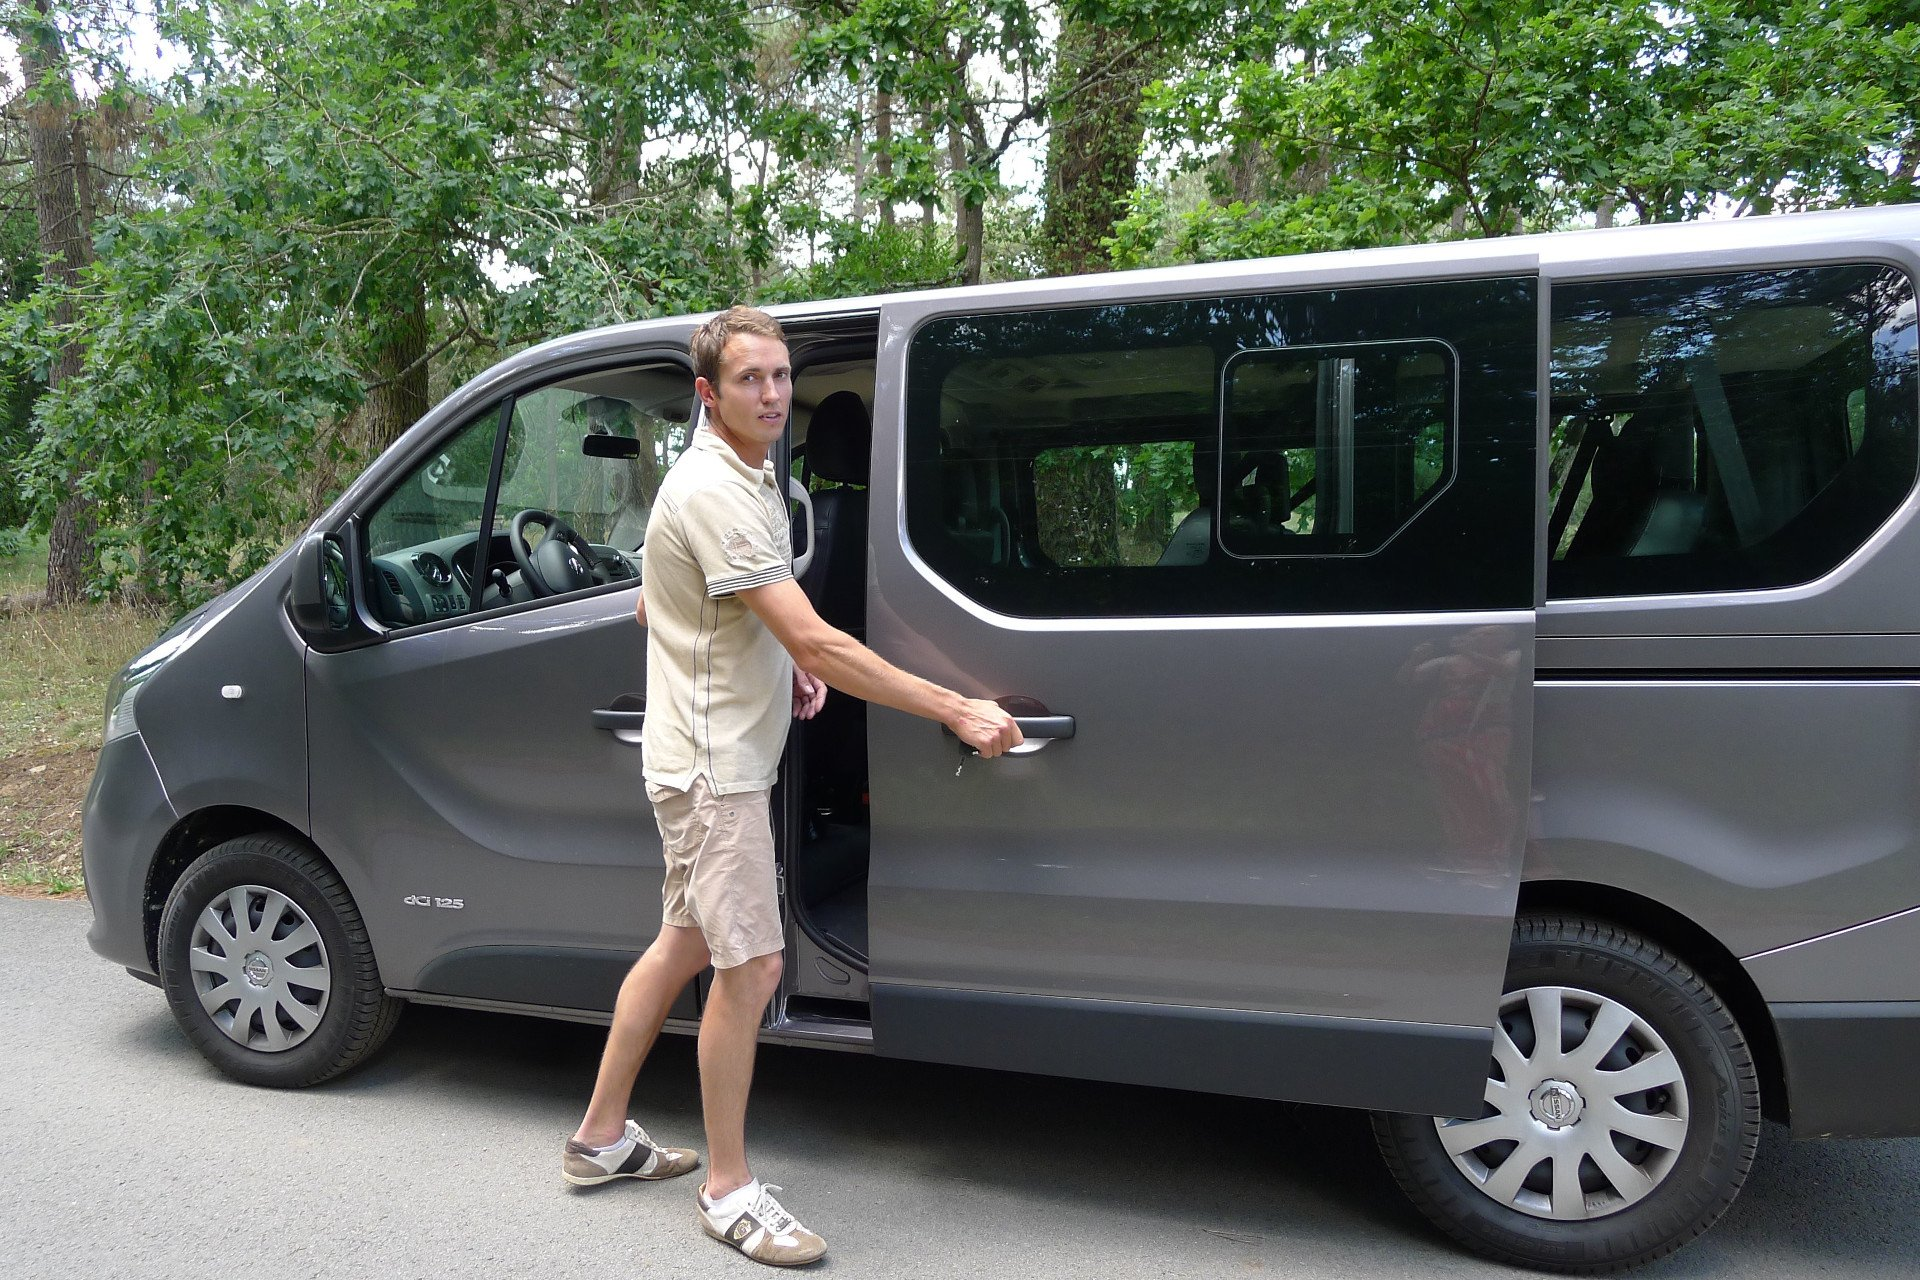 minivan-guide privé-tour privé-Morbihan-Bretagne-France